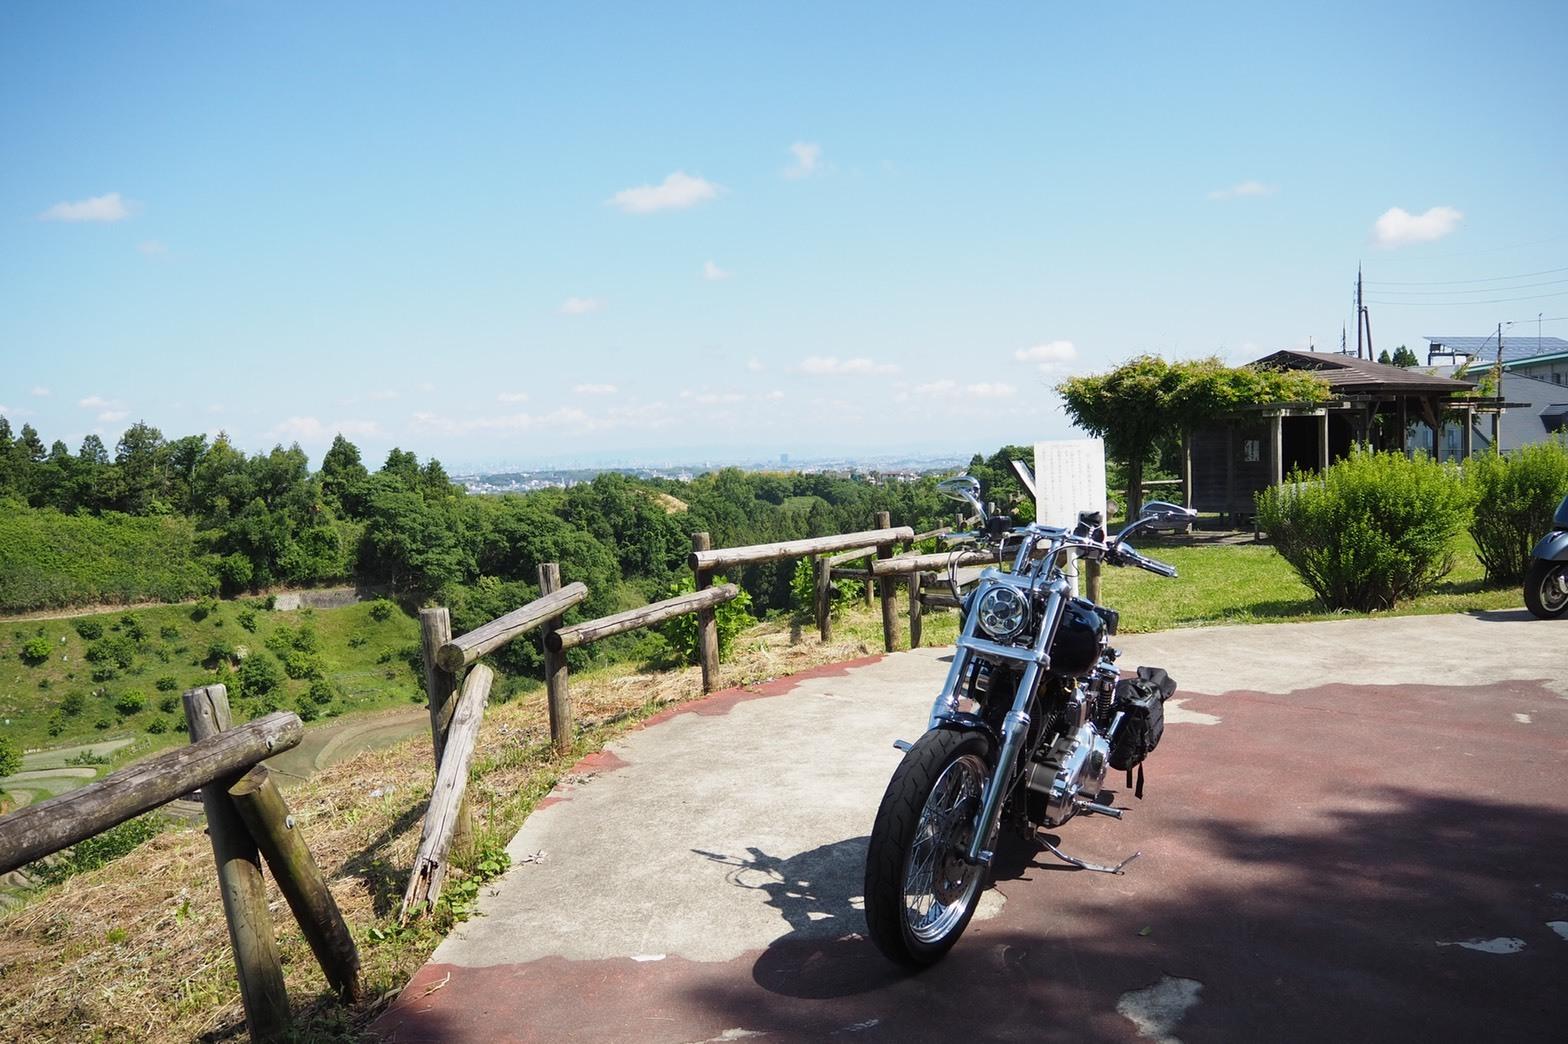 harleydavidson-motorcycle-touring-blog-osaka-chihayaakasa-village-2.jpg